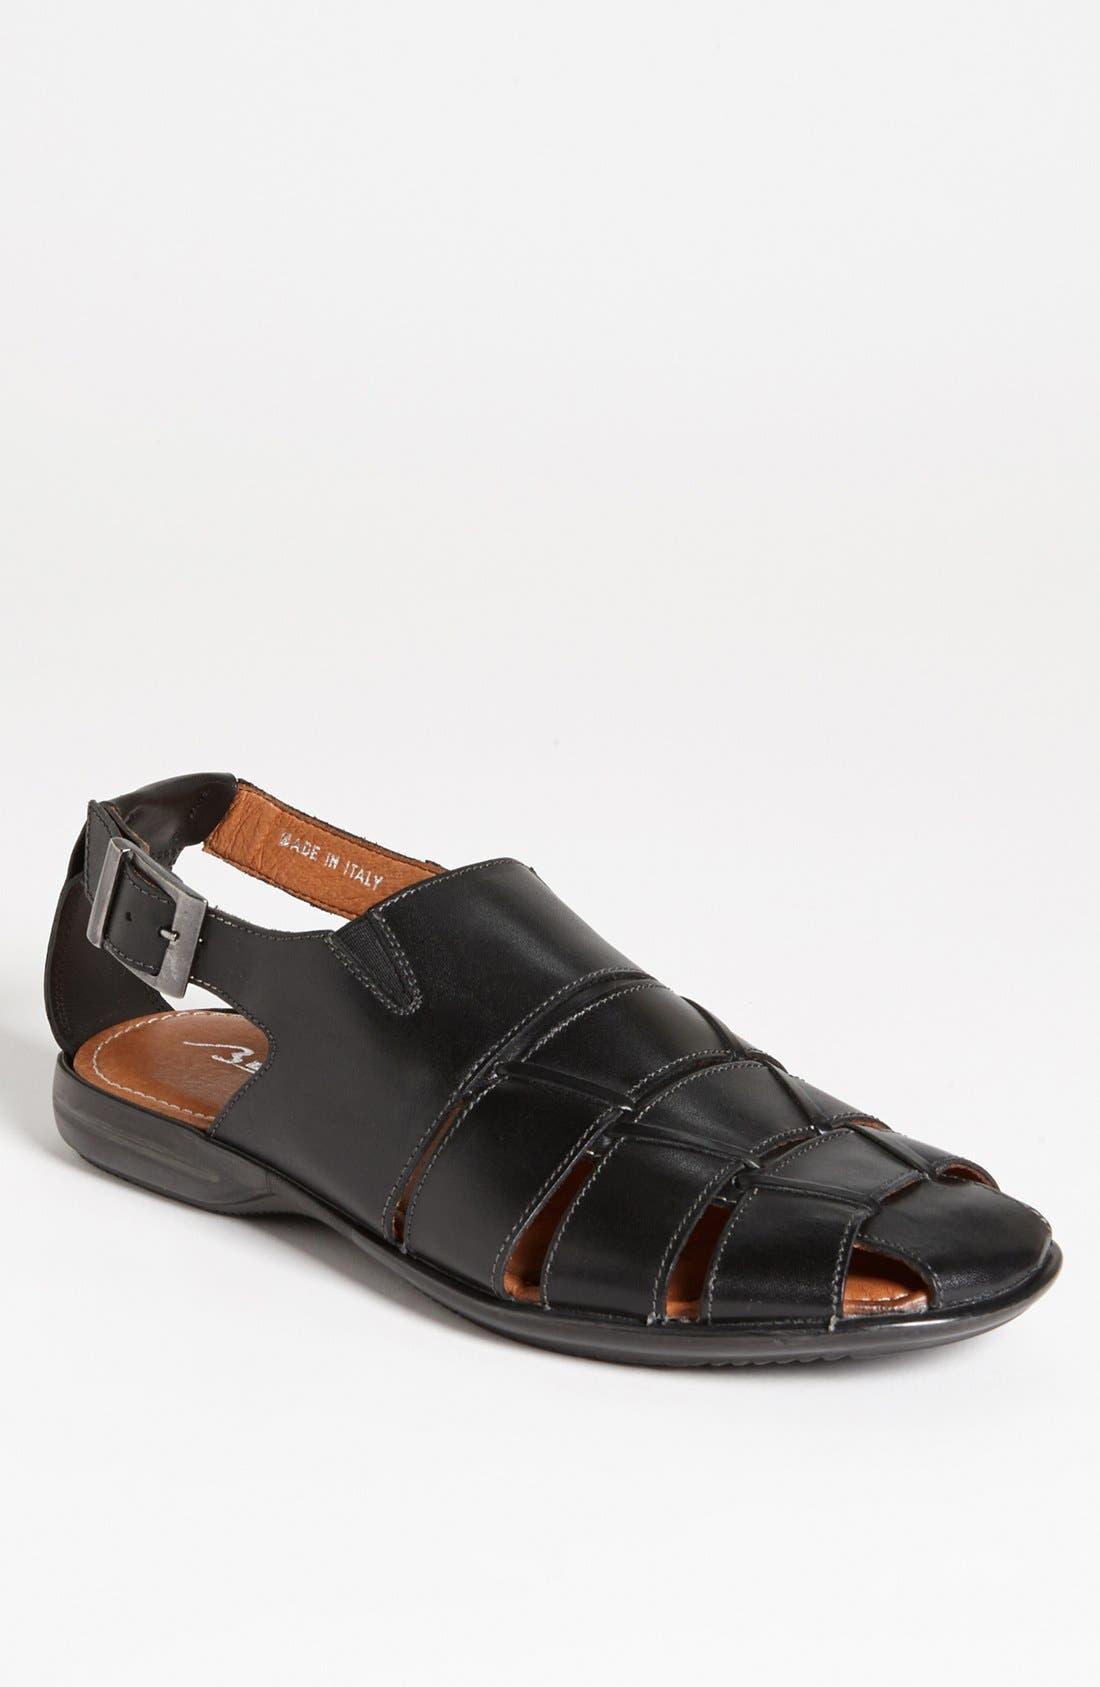 Main Image - Bacco Bucci 'Valdano' Sandal (Men)